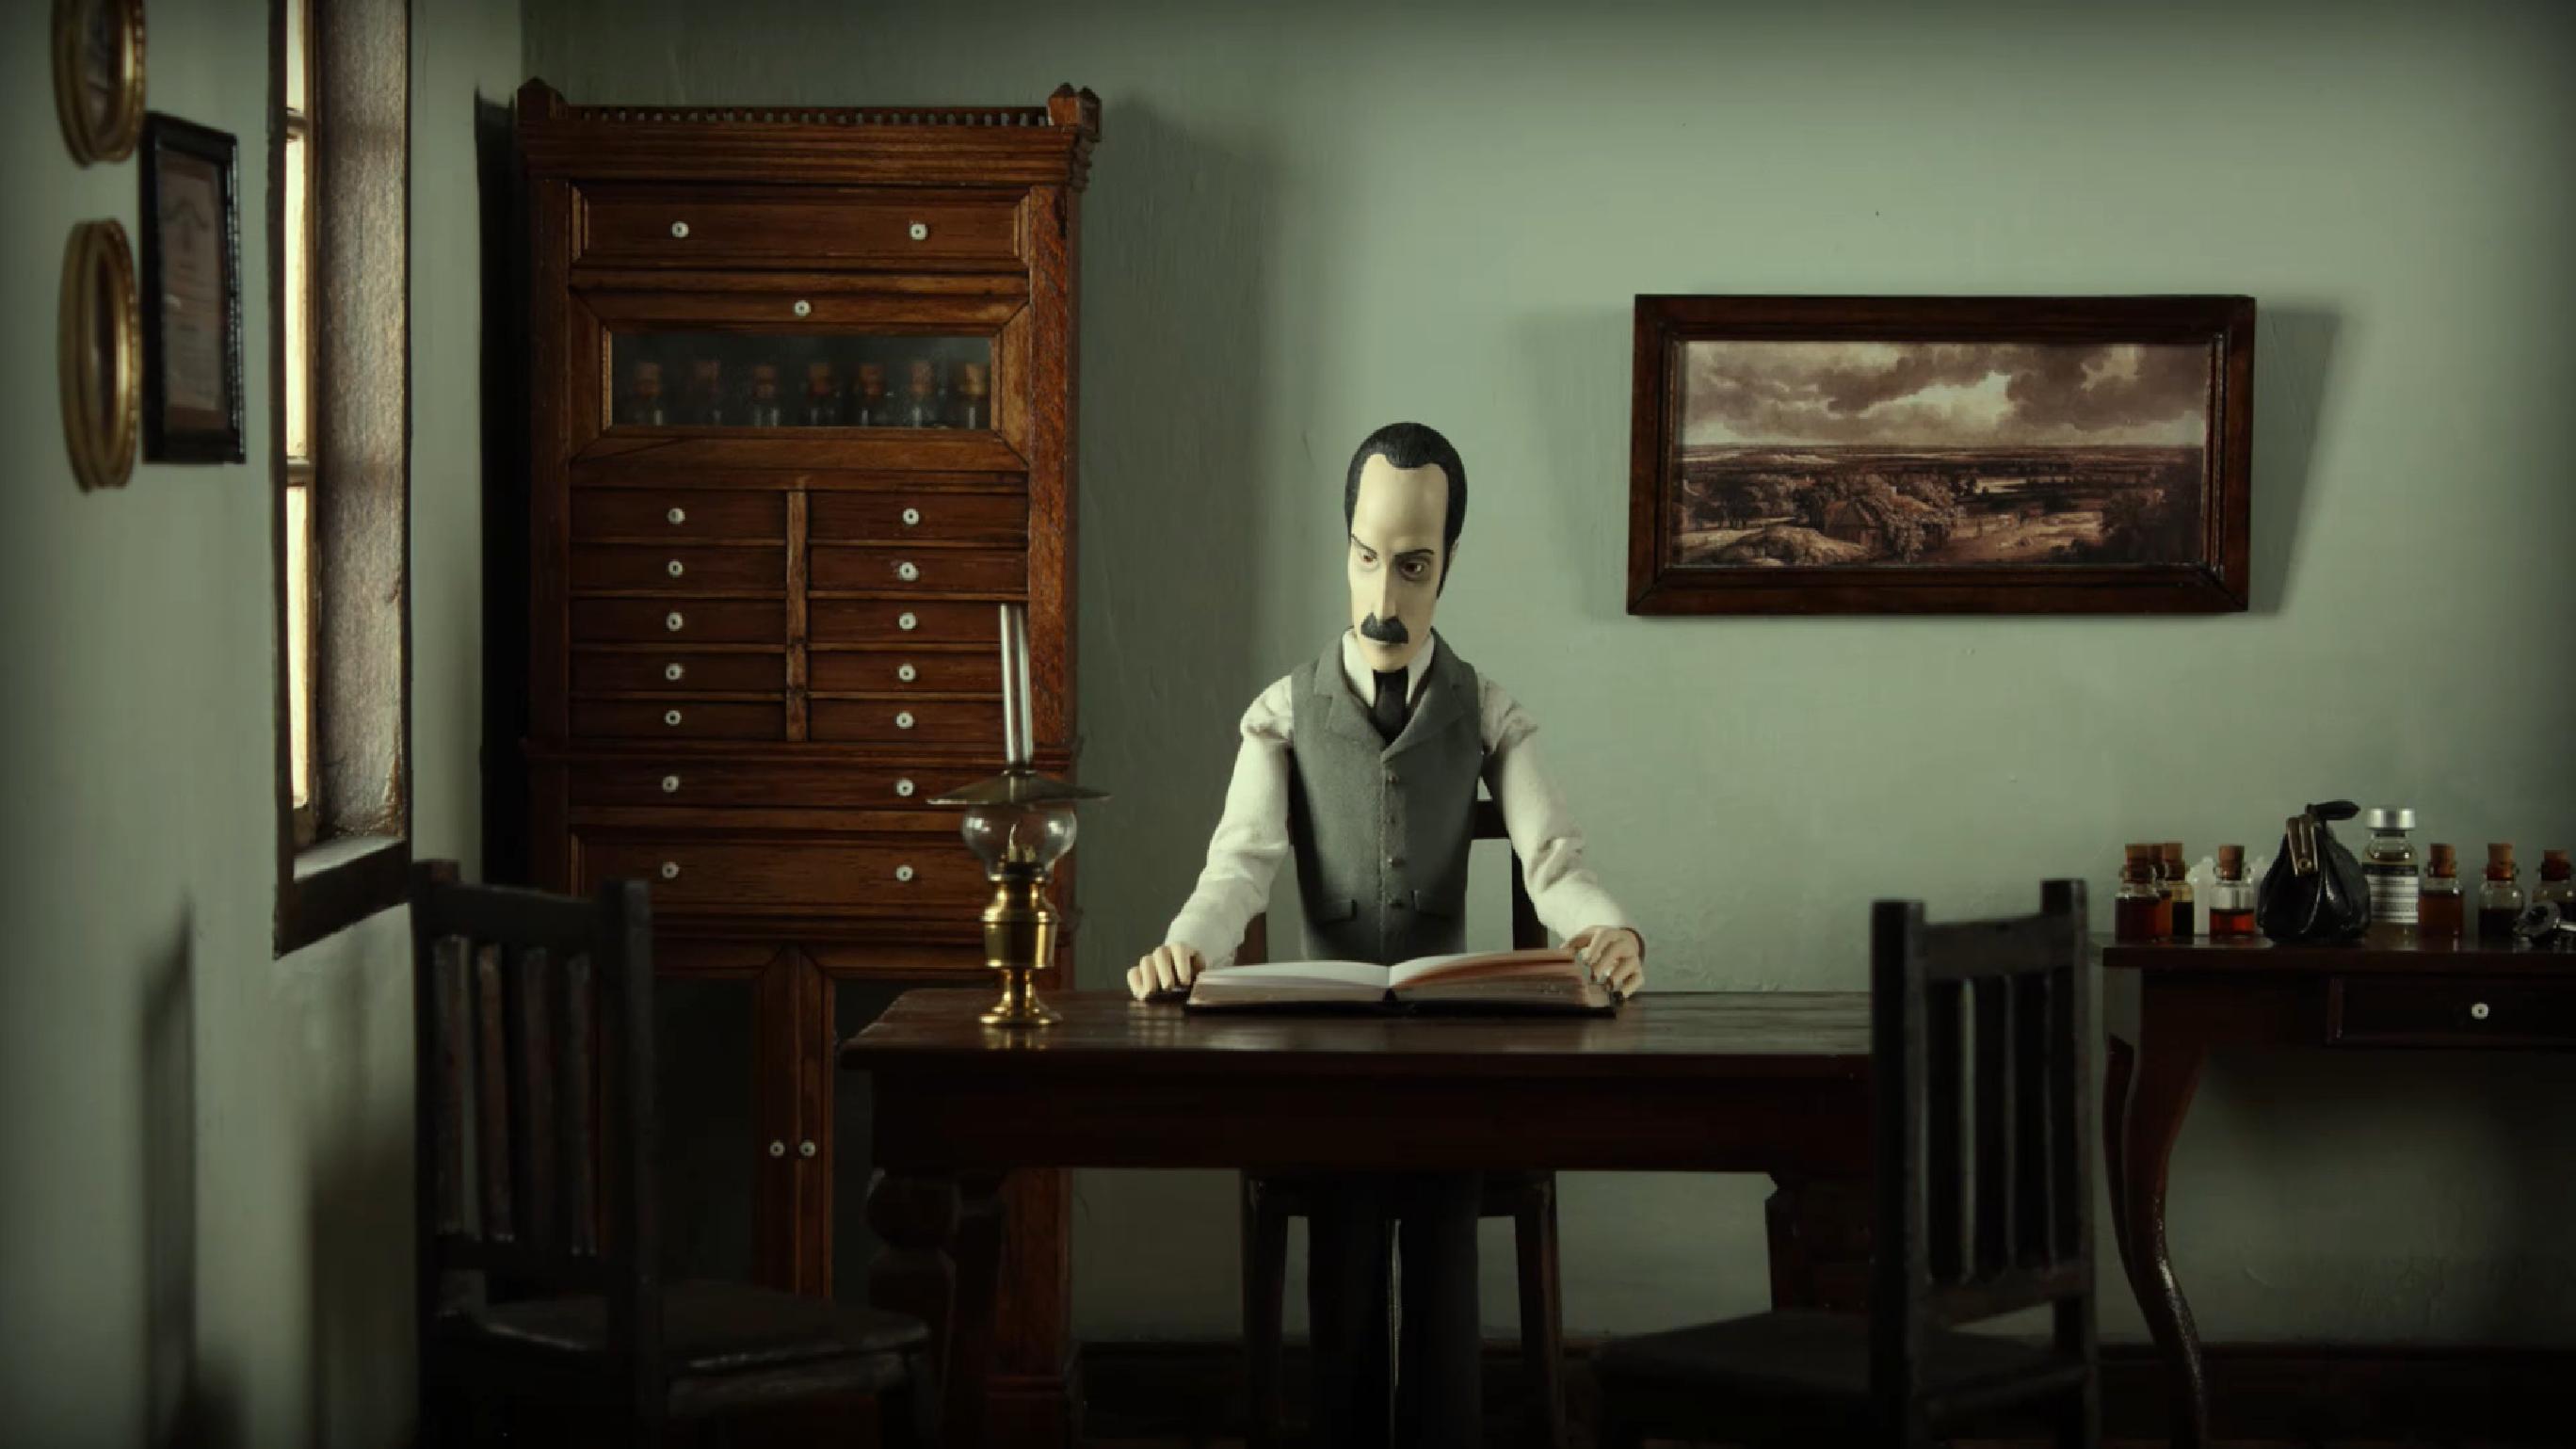 Art Assistance for 'The Village' stop-motion film